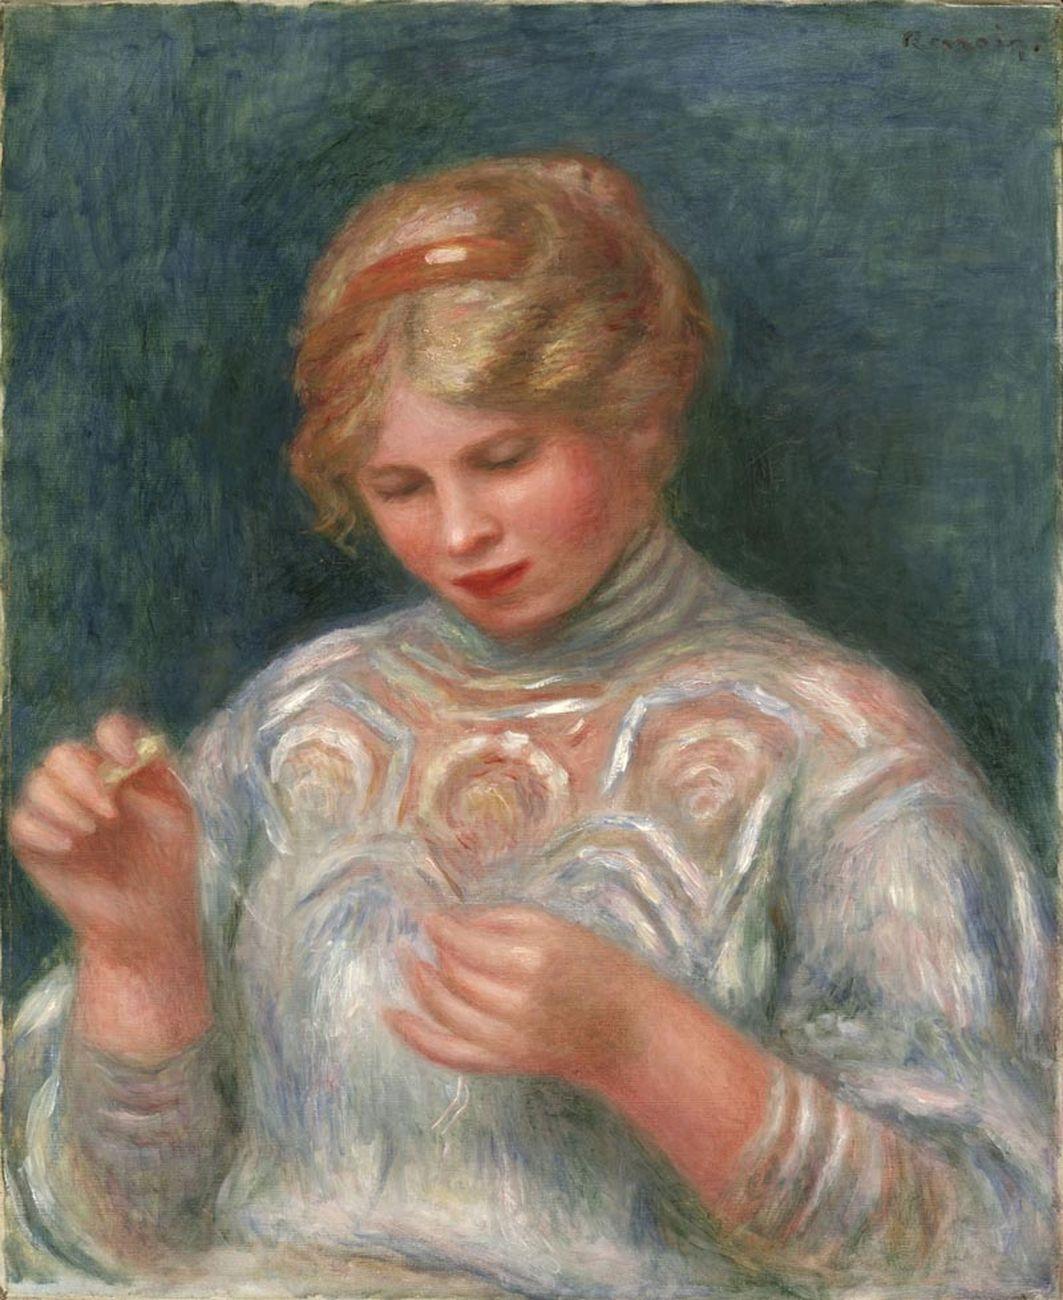 Pierre-Auguste Renoir, Ragazza che fa il merletto (1906; olio su tela, 56,5 x 46,7 cm; Filadelfia, Philadelphia Museum of Art)